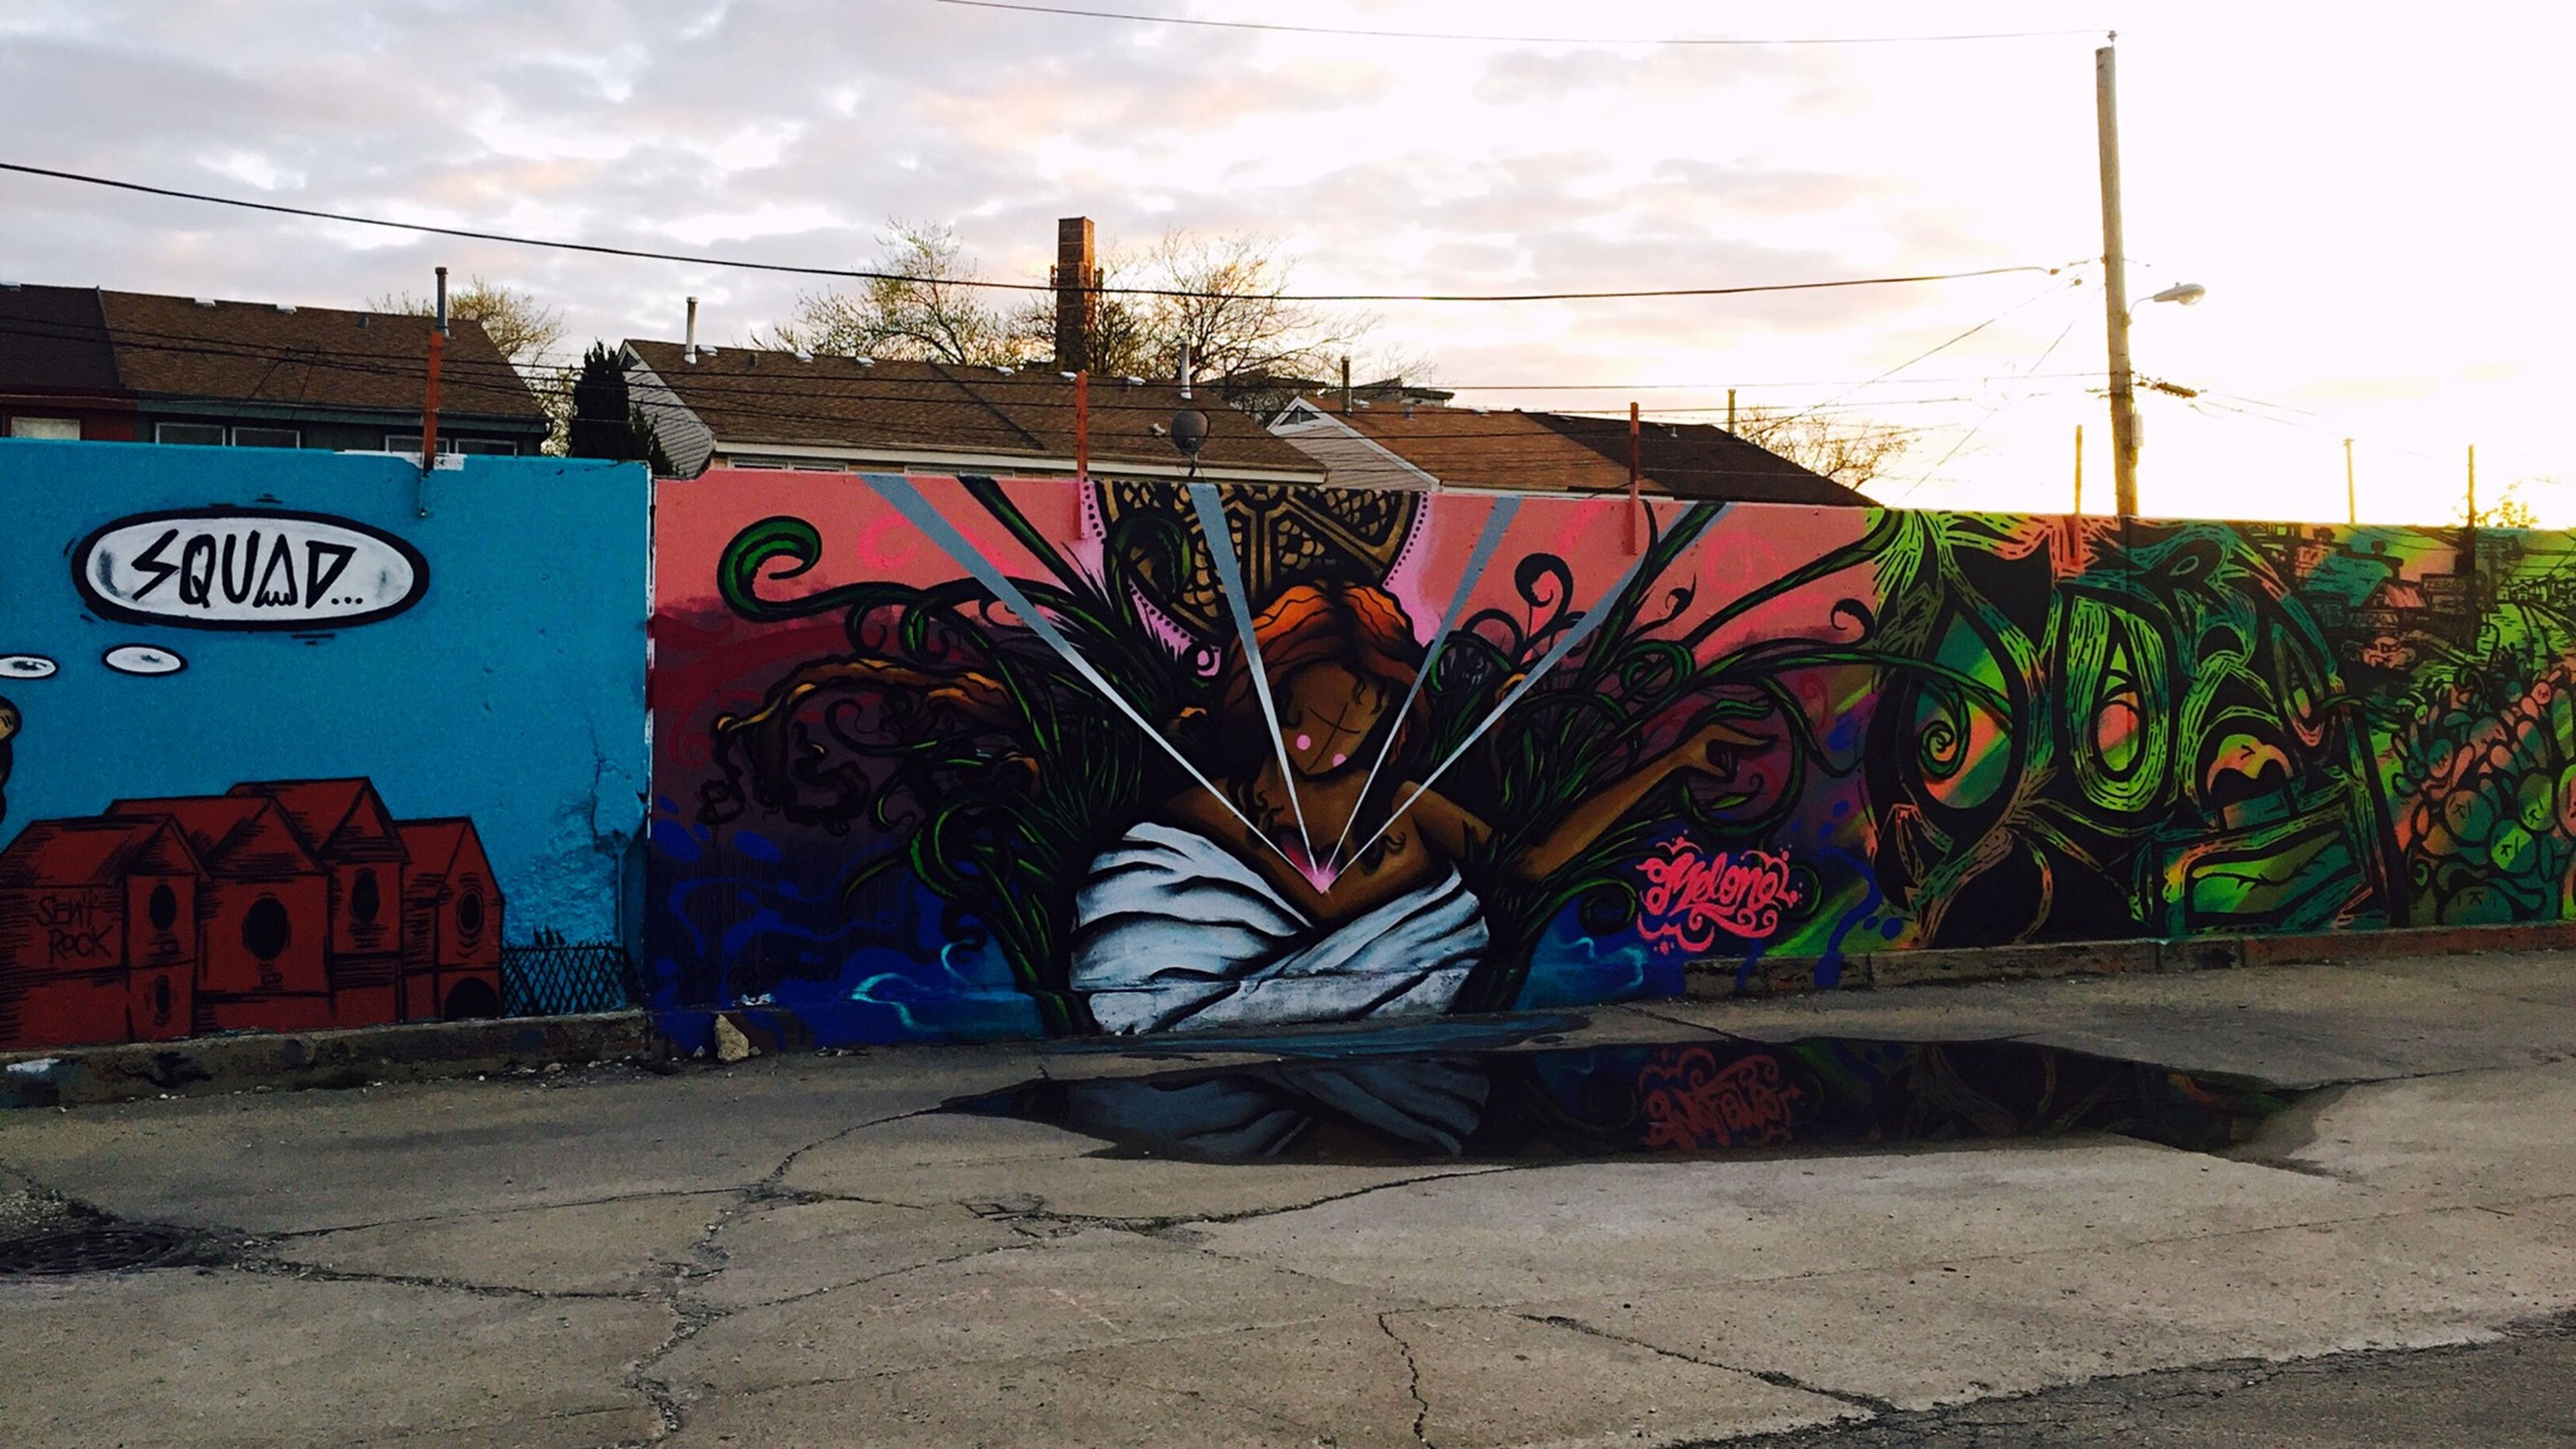 graffiti, architecture, built structure, building exterior, art, sky, wall - building feature, creativity, art and craft, text, street art, vandalism, day, transportation, outdoors, human representation, communication, western script, wall, power line